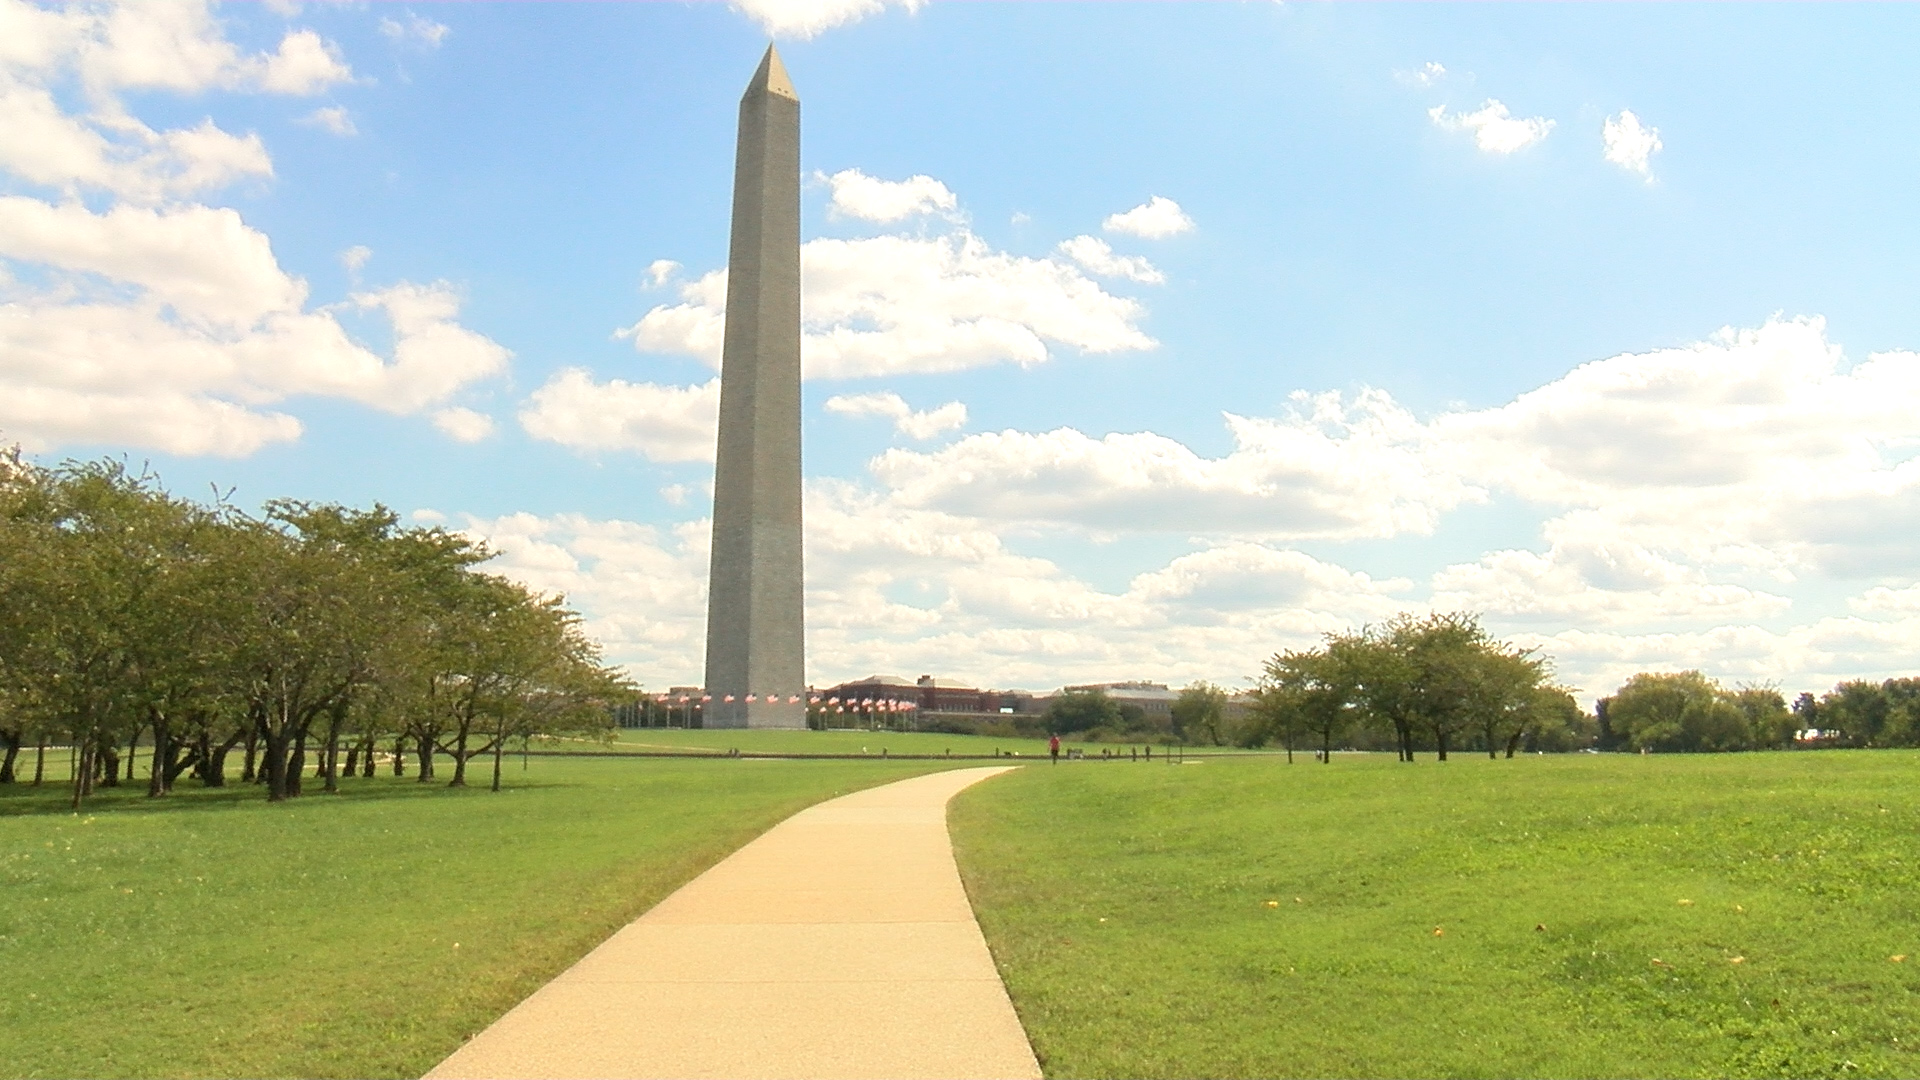 Tickets To Visit Washington Monument